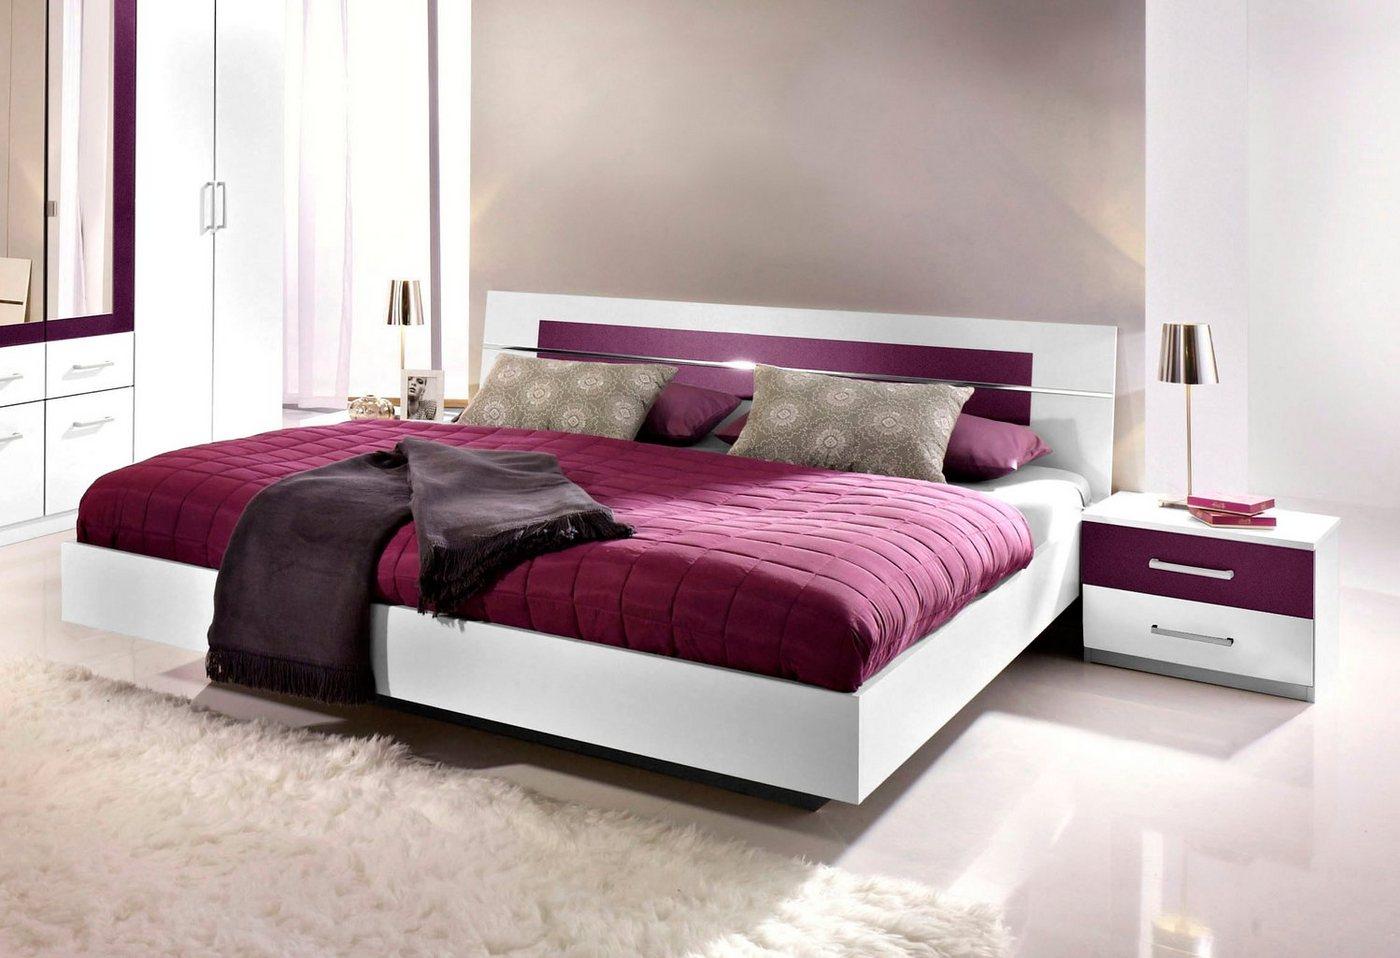 Bed incl. 2 bedtafeltjes, Made in Germany